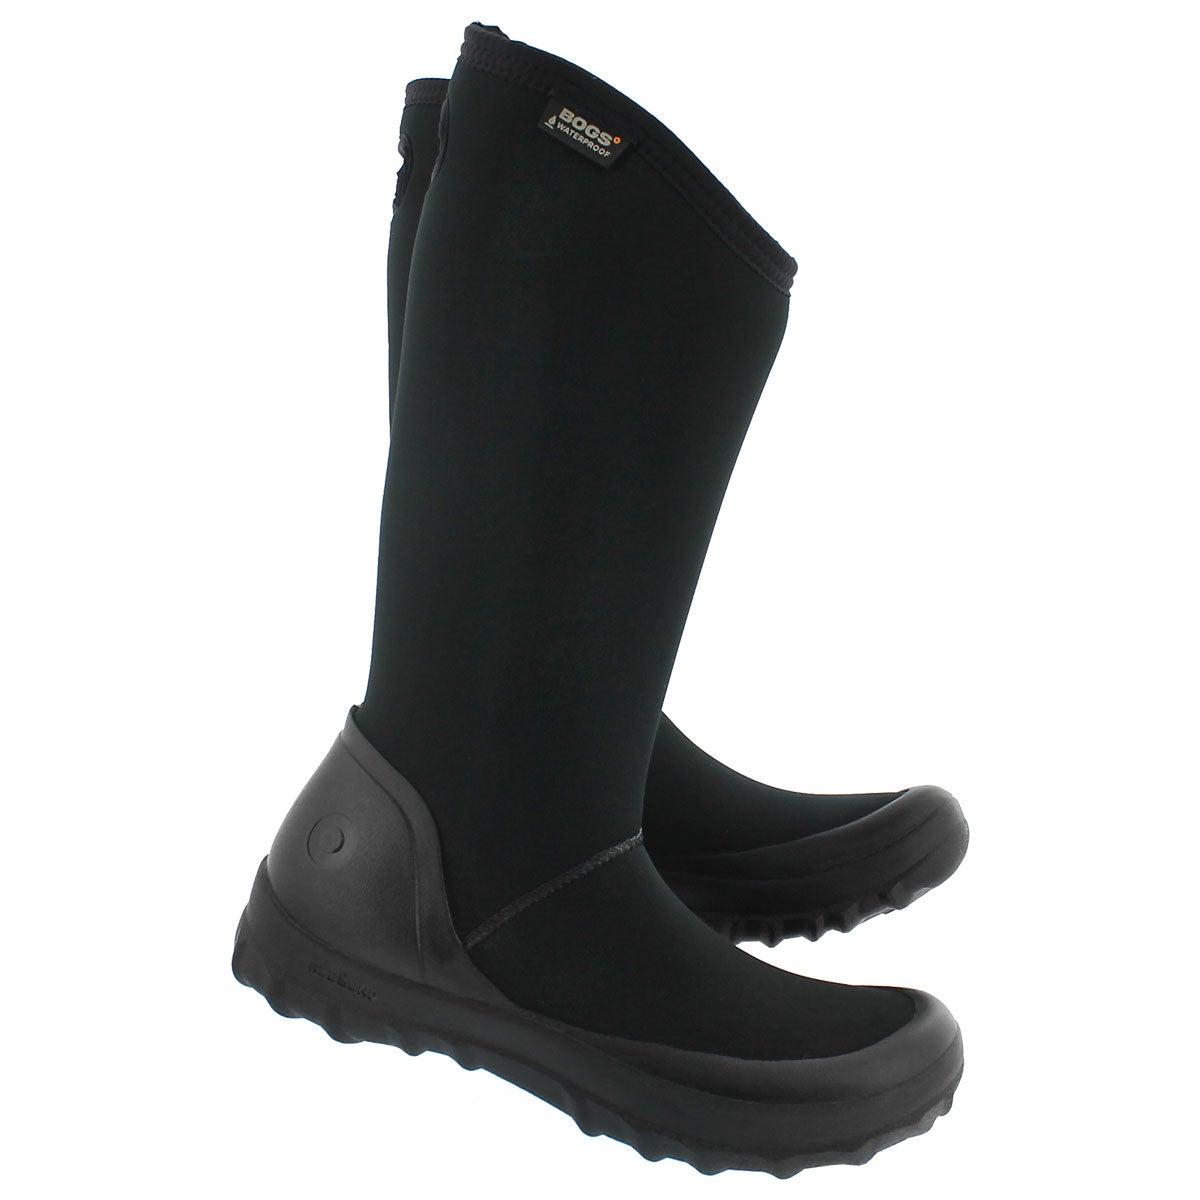 Lds Kettering blk tall wtpf winter boot